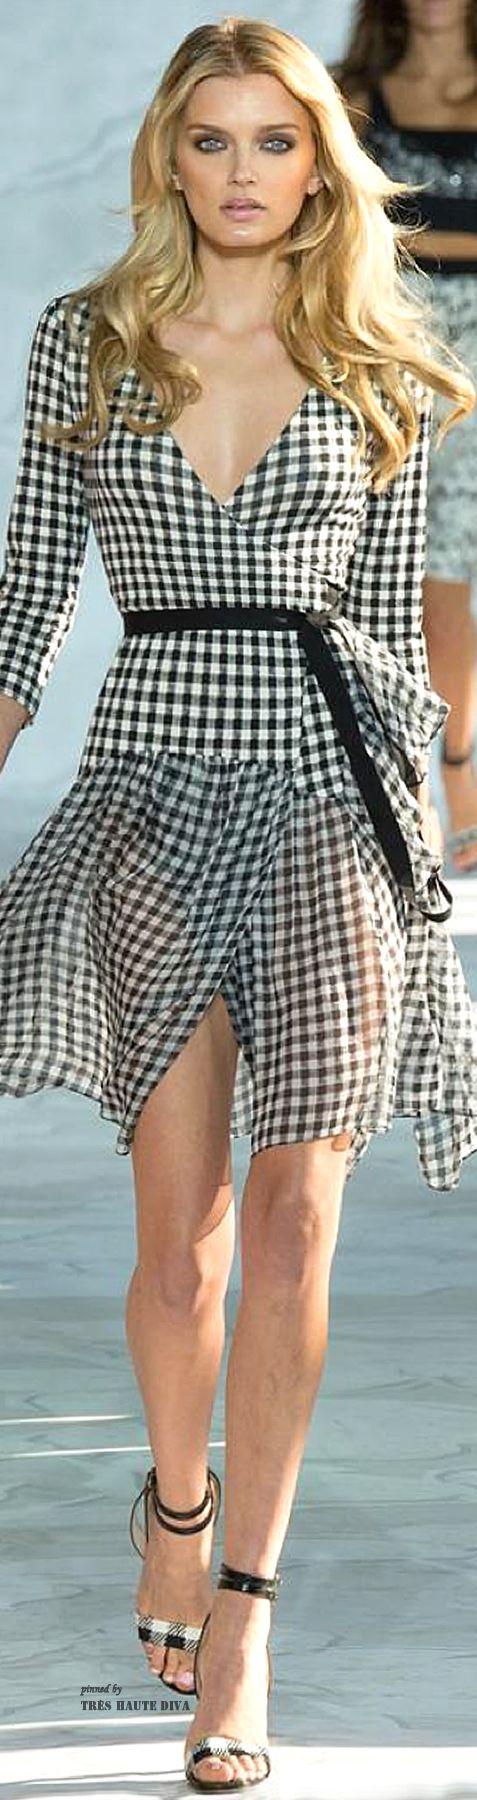 Black and white gingham check dress ~ Diane von Furstenberg - Spring/Summer Collection 2015 RTW...x